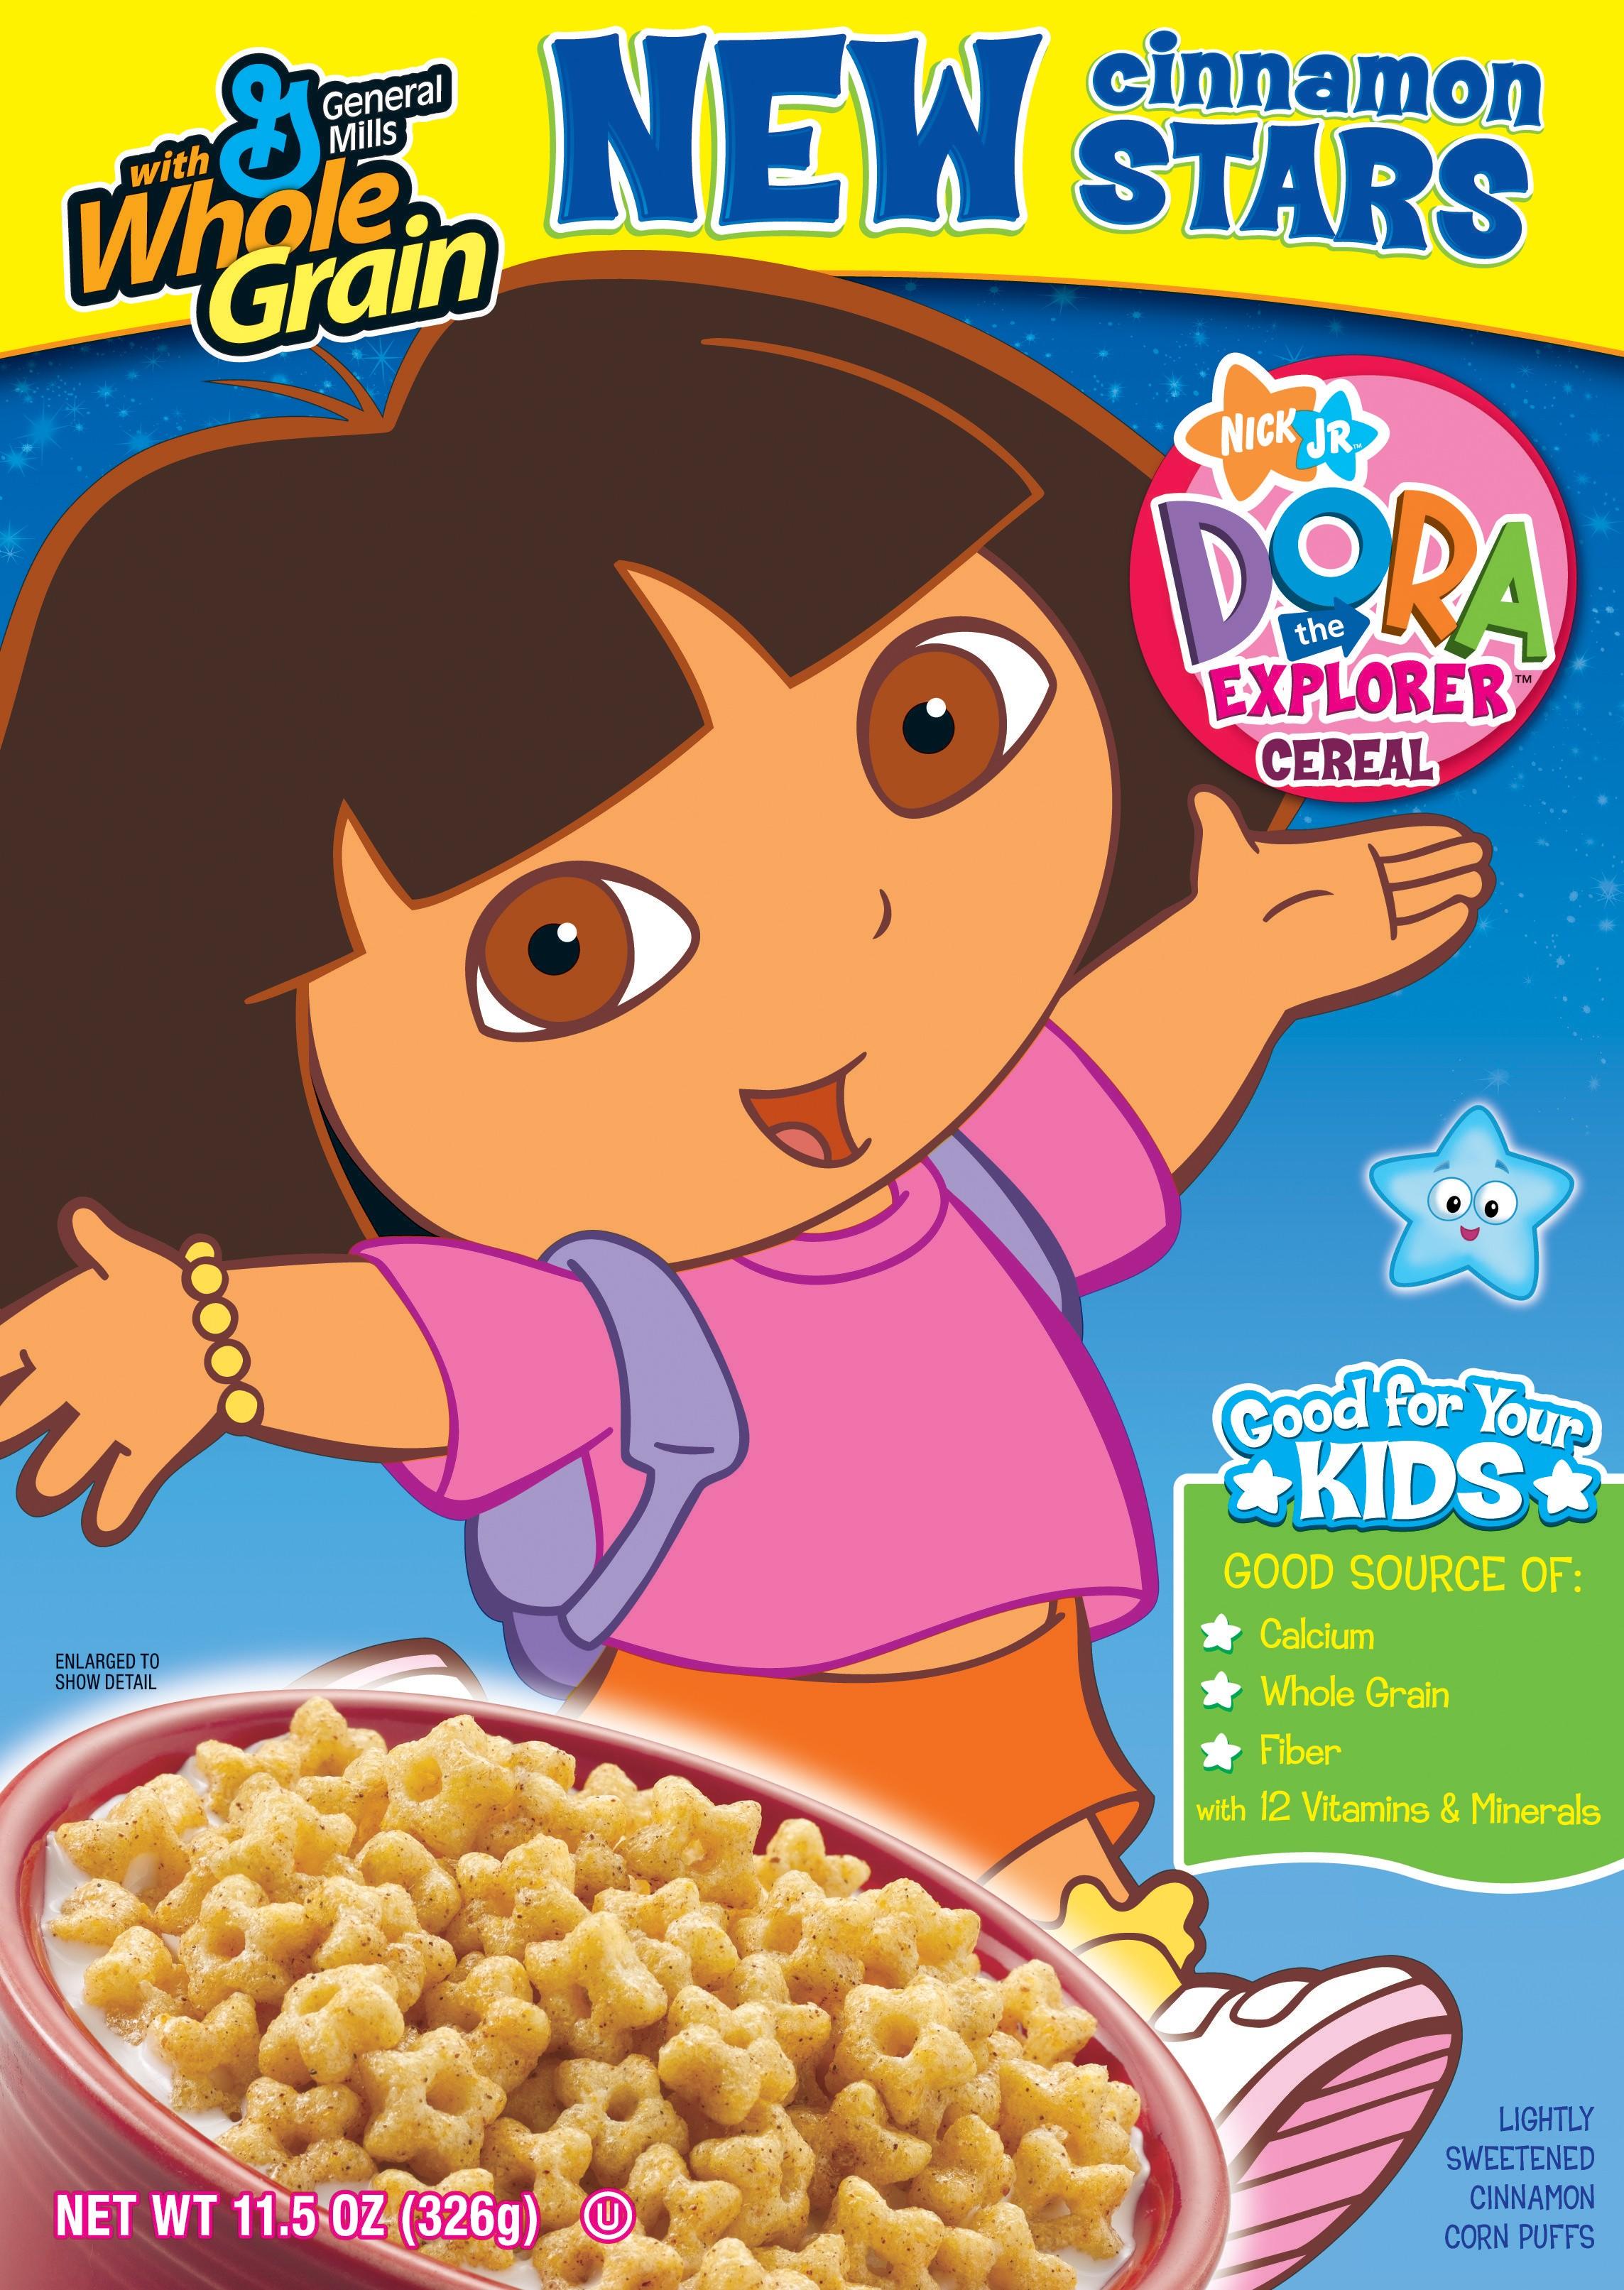 General Mills Dora the Explorer